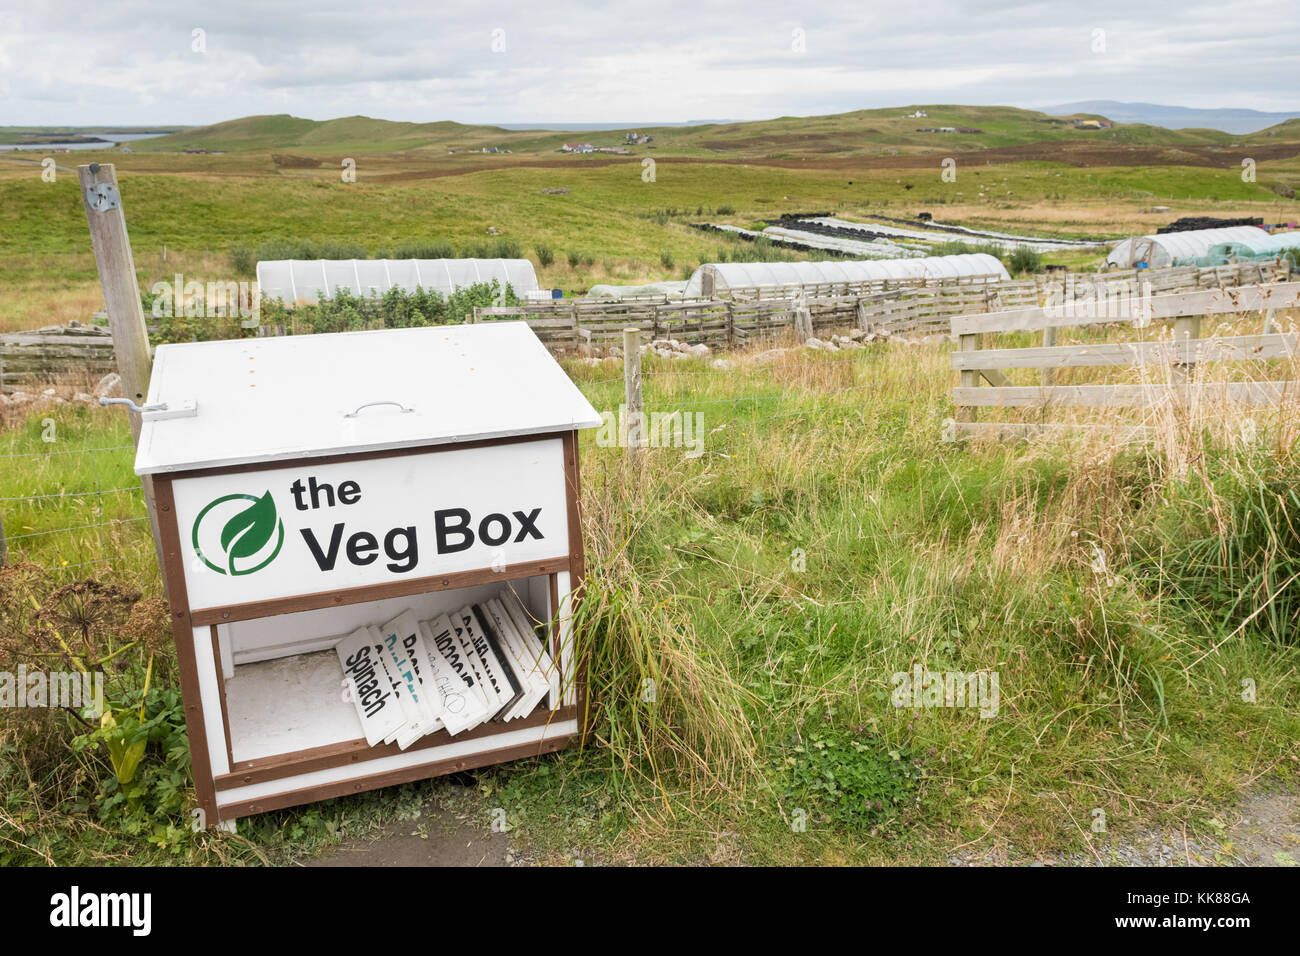 Honesty box for farm produce from croft, Sandness, Shetland Islands, Scotland, UK - Stock Image